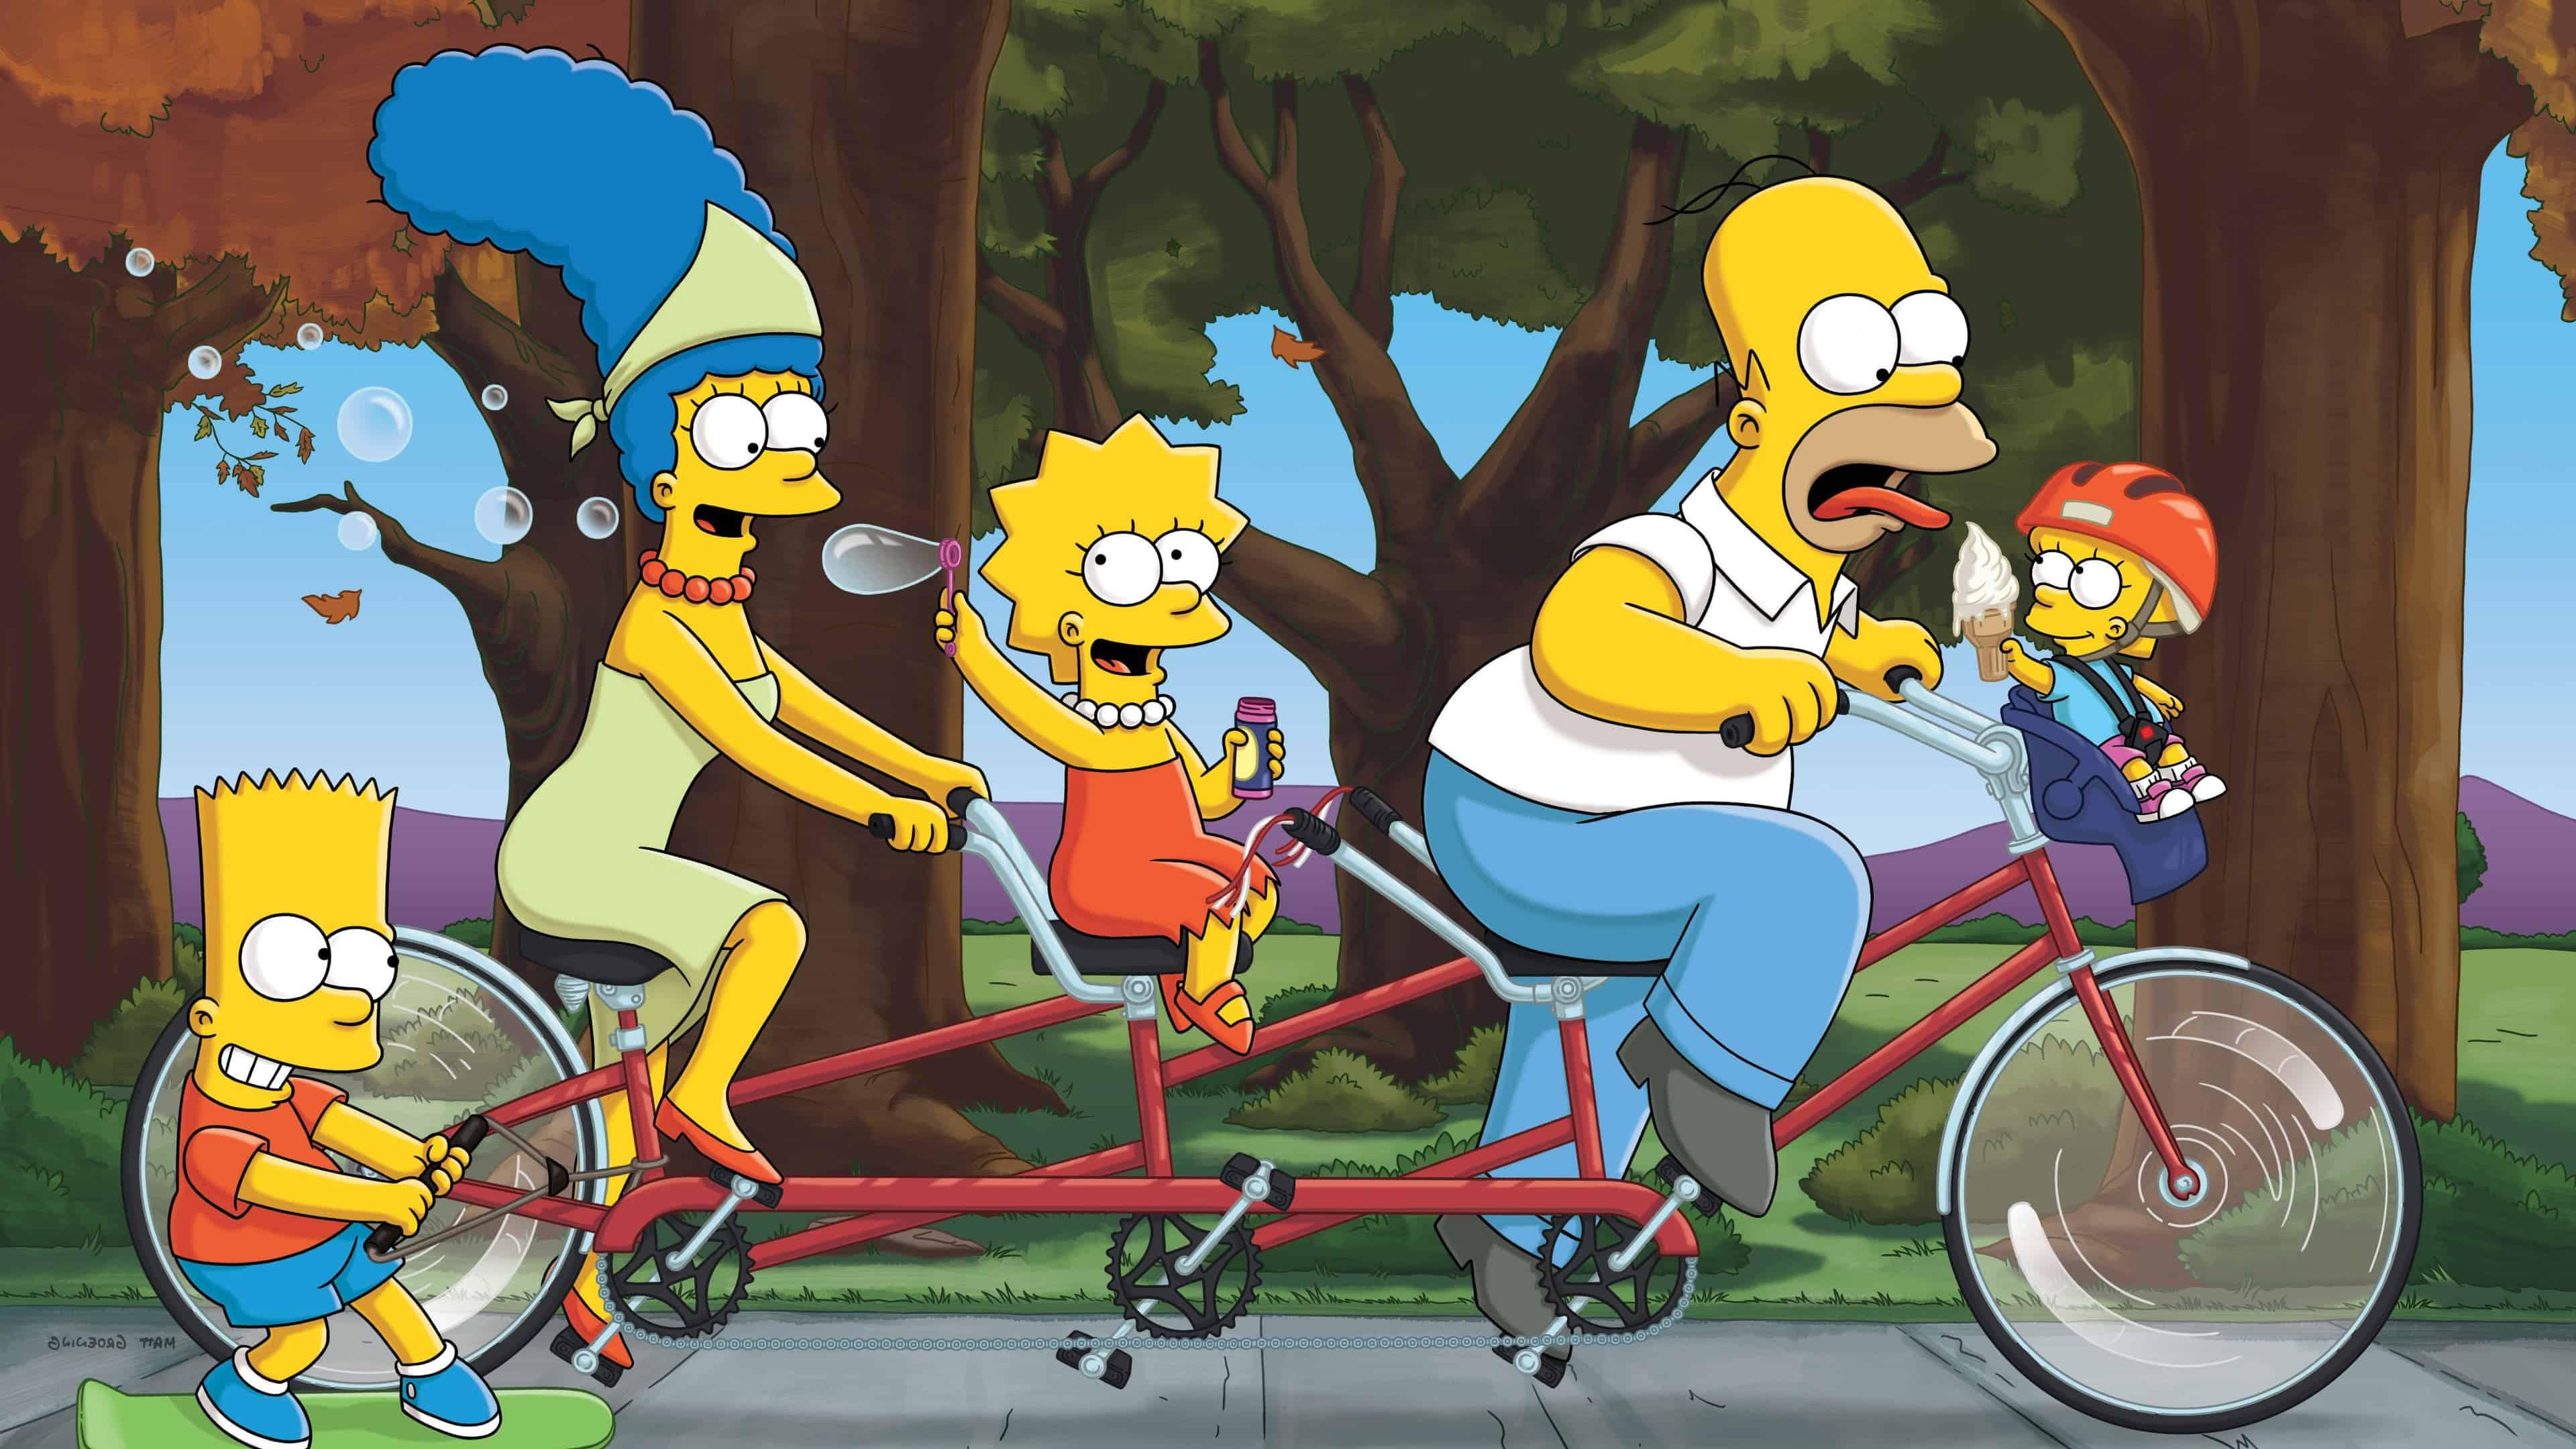 Ultra Hd Wallpapers Cars Simpsons Family Uhd 4k Wallpaper Pixelz